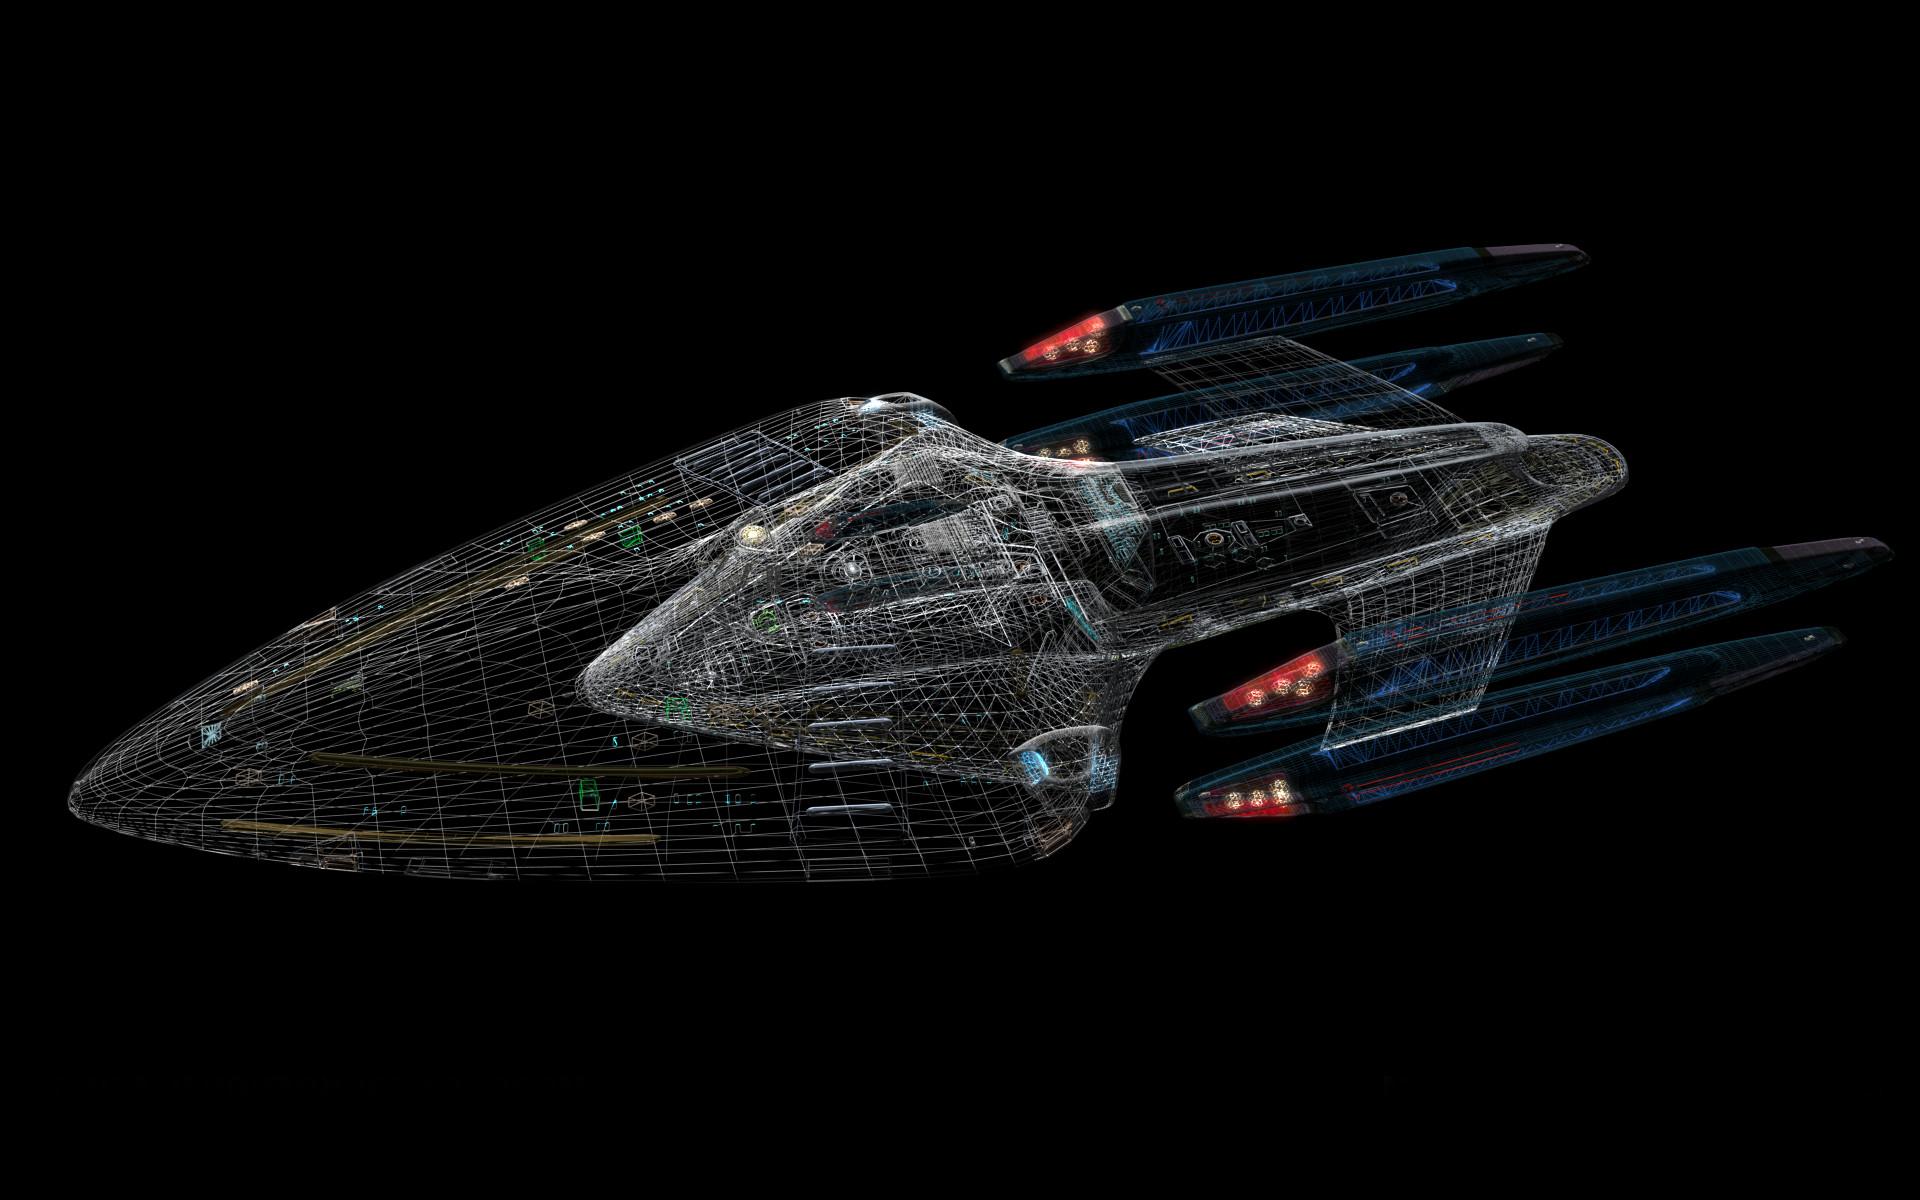 … Prometheus – Star Trek HD Wallpaper 1920×1200